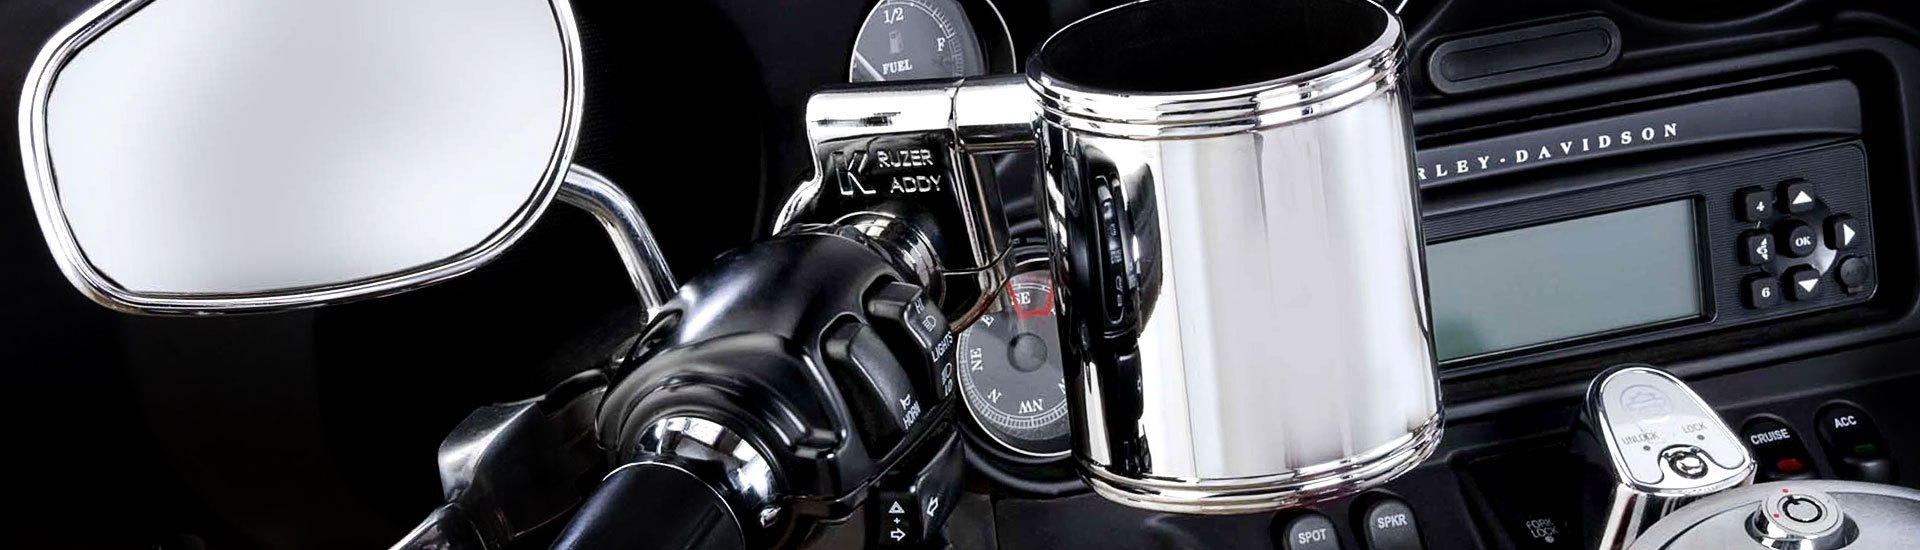 Keenso Motorbike Drink Cup Holder Plastic Water Beverage Support Handlebar Bottle Stand Adapter Motorcycle Water Bottle Cup Holder Black